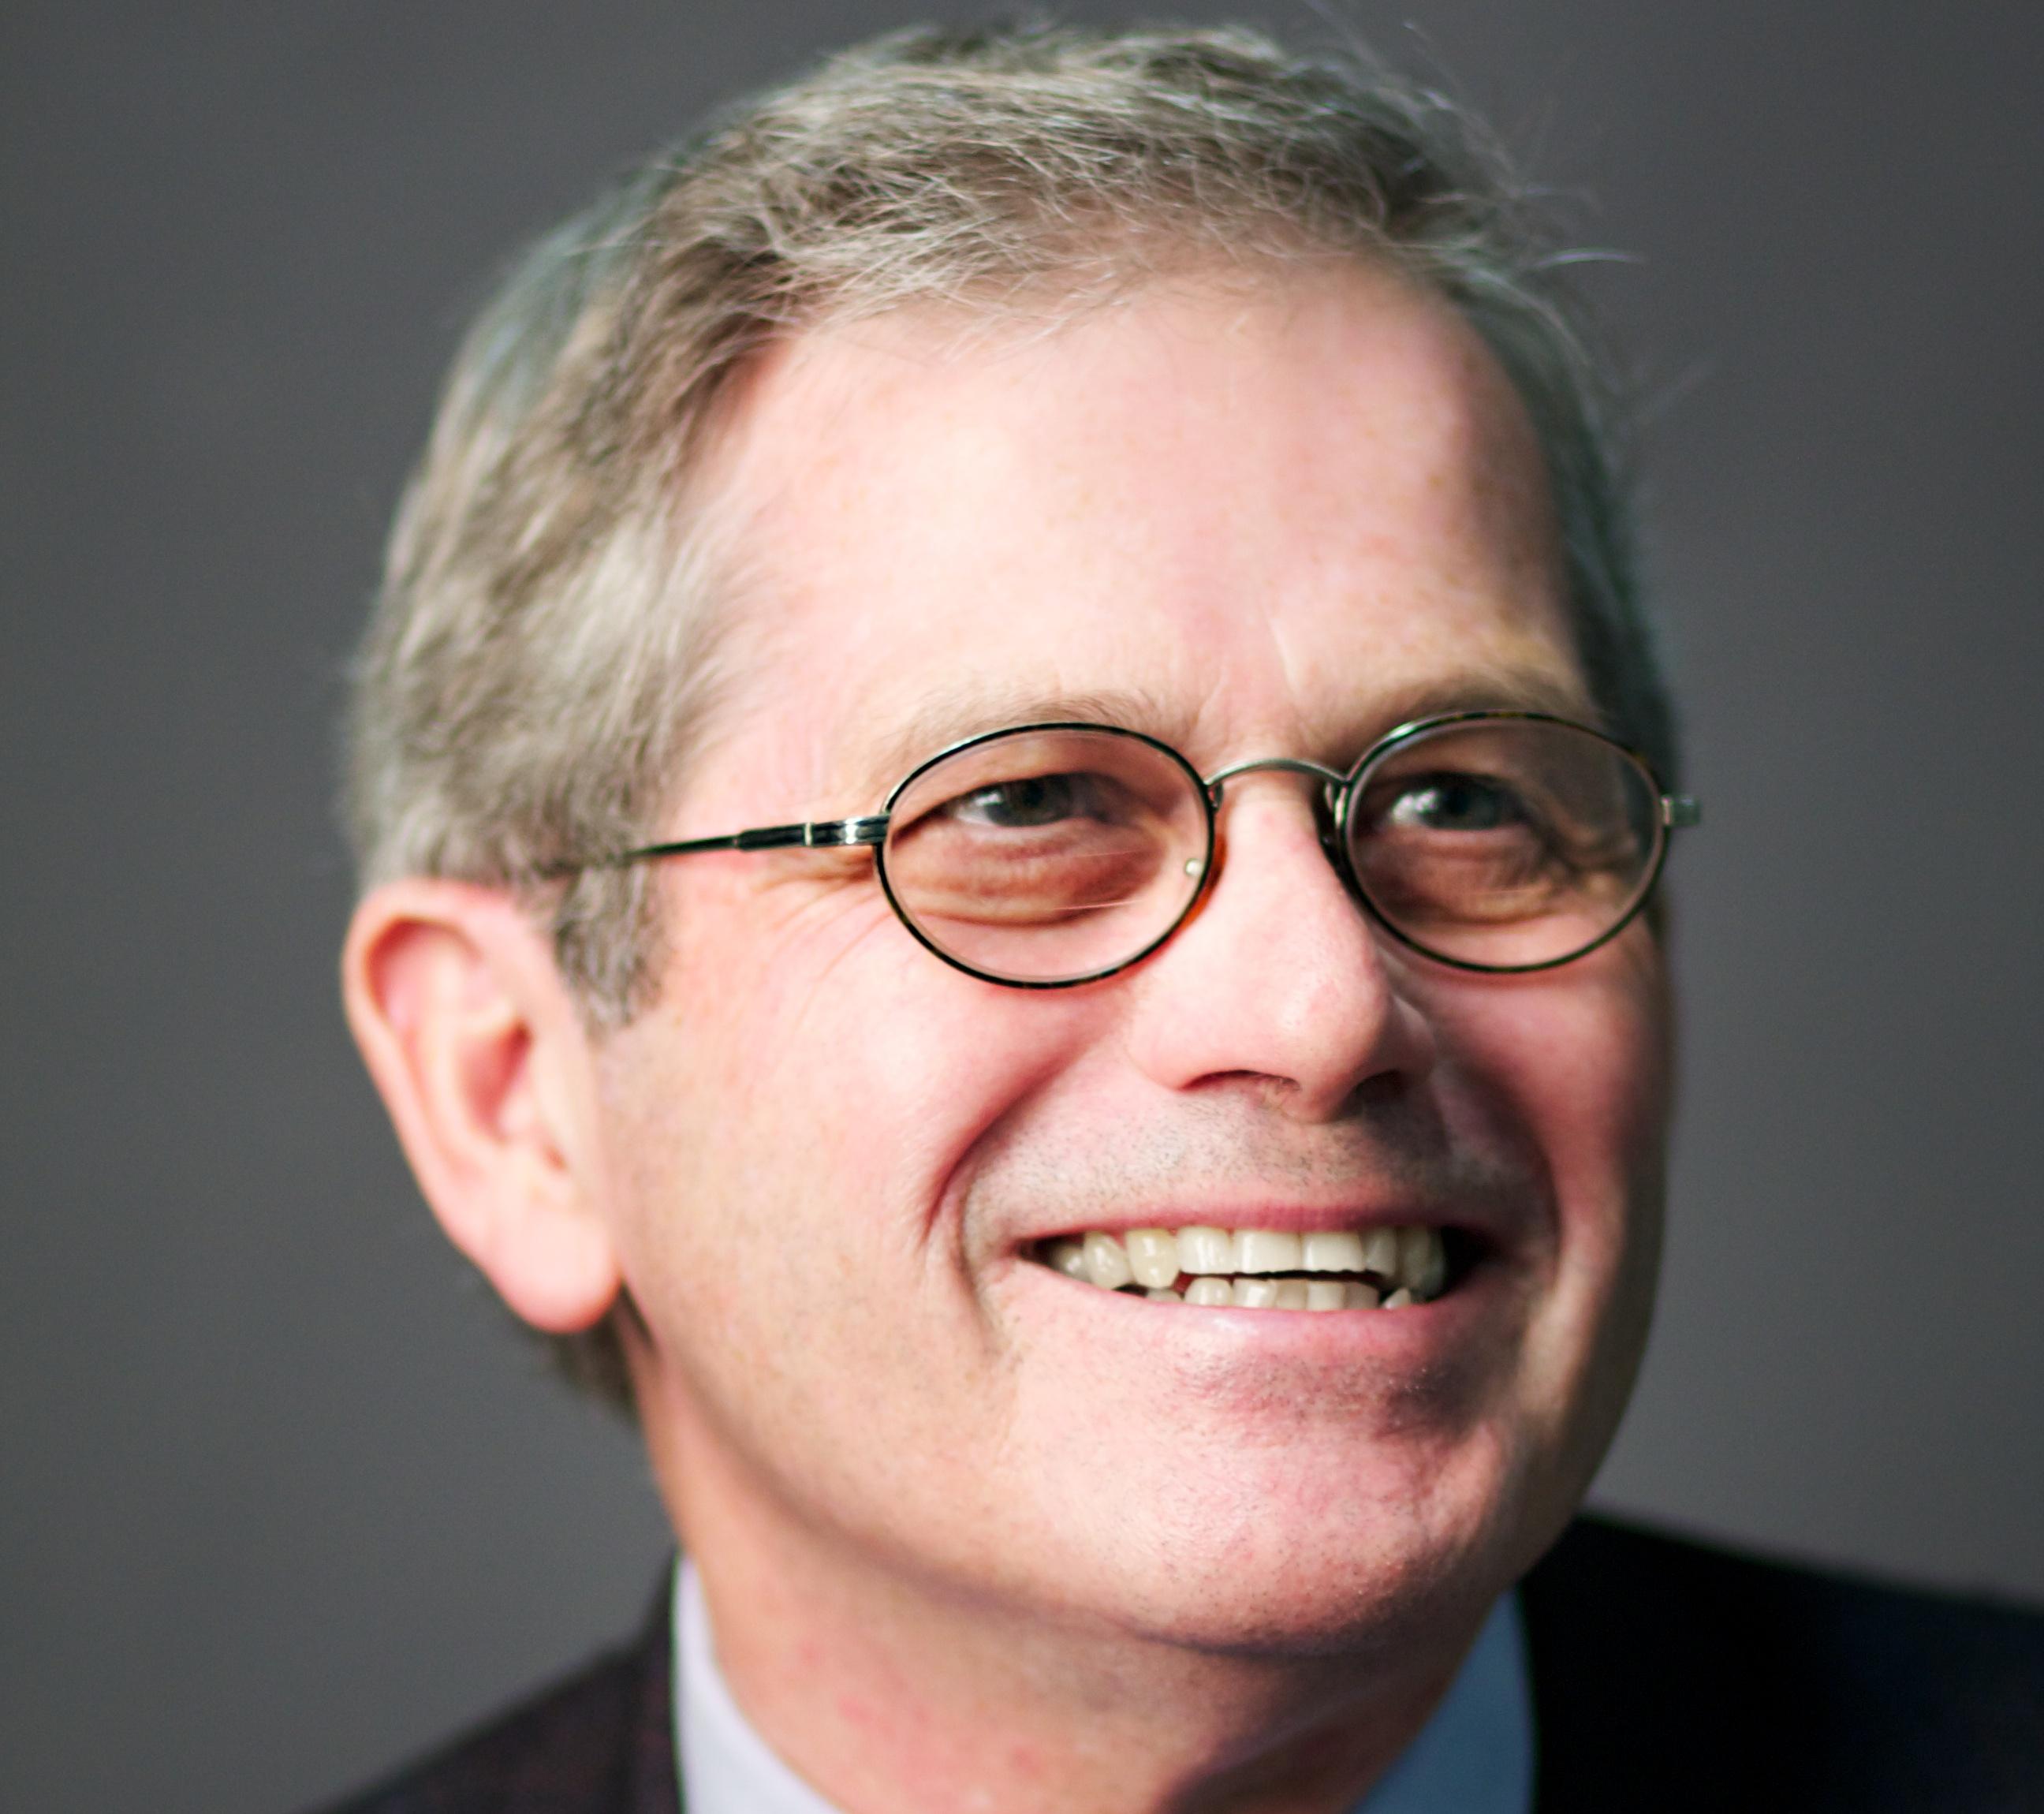 ISER Executive Director Ralph Townsend